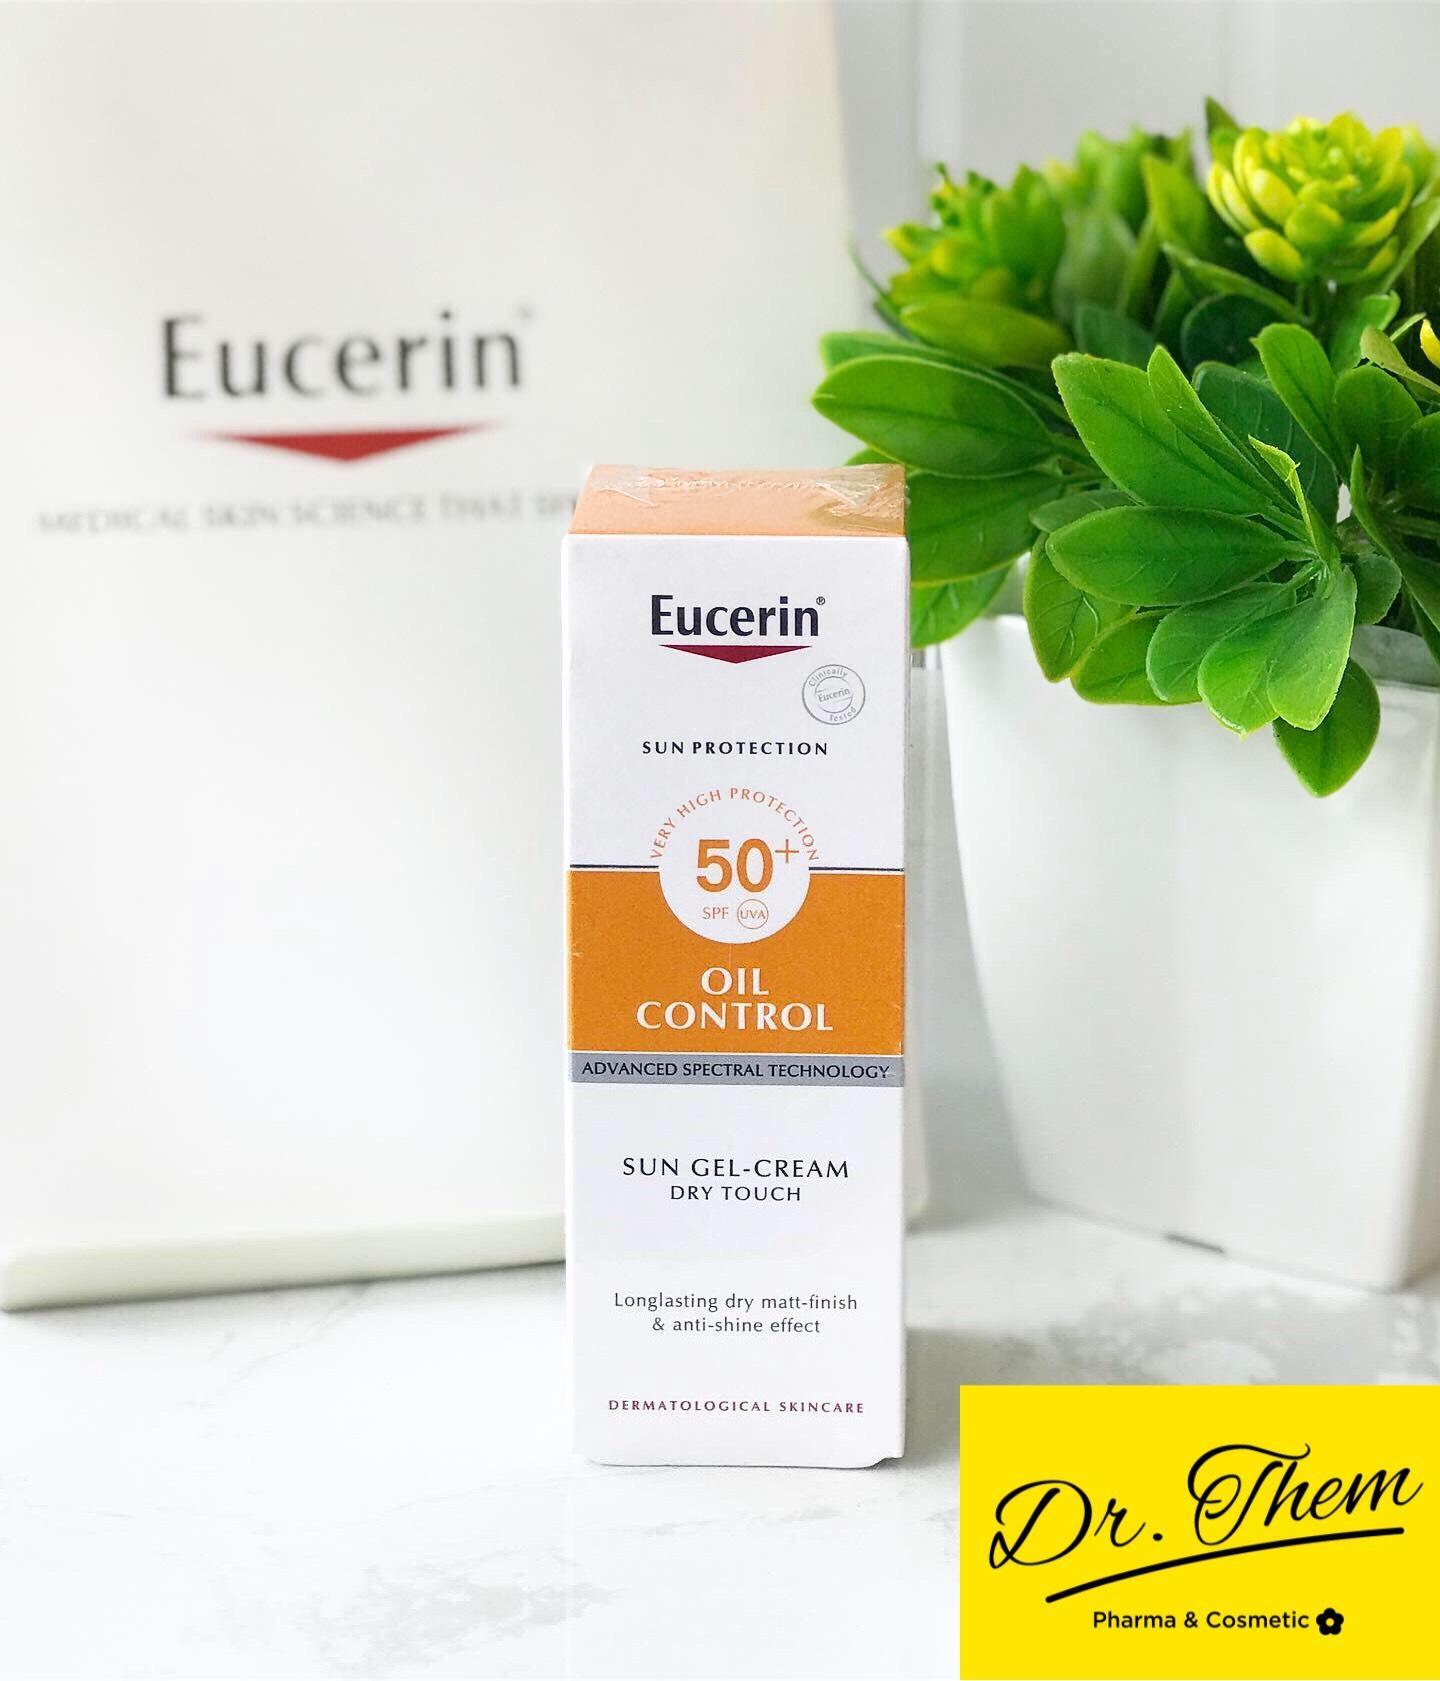 Kem Chống Nắng Eucerin Sun Gel Cream Oil Control SPF 50+ Cho Da Dầu Mụn nhập khẩu